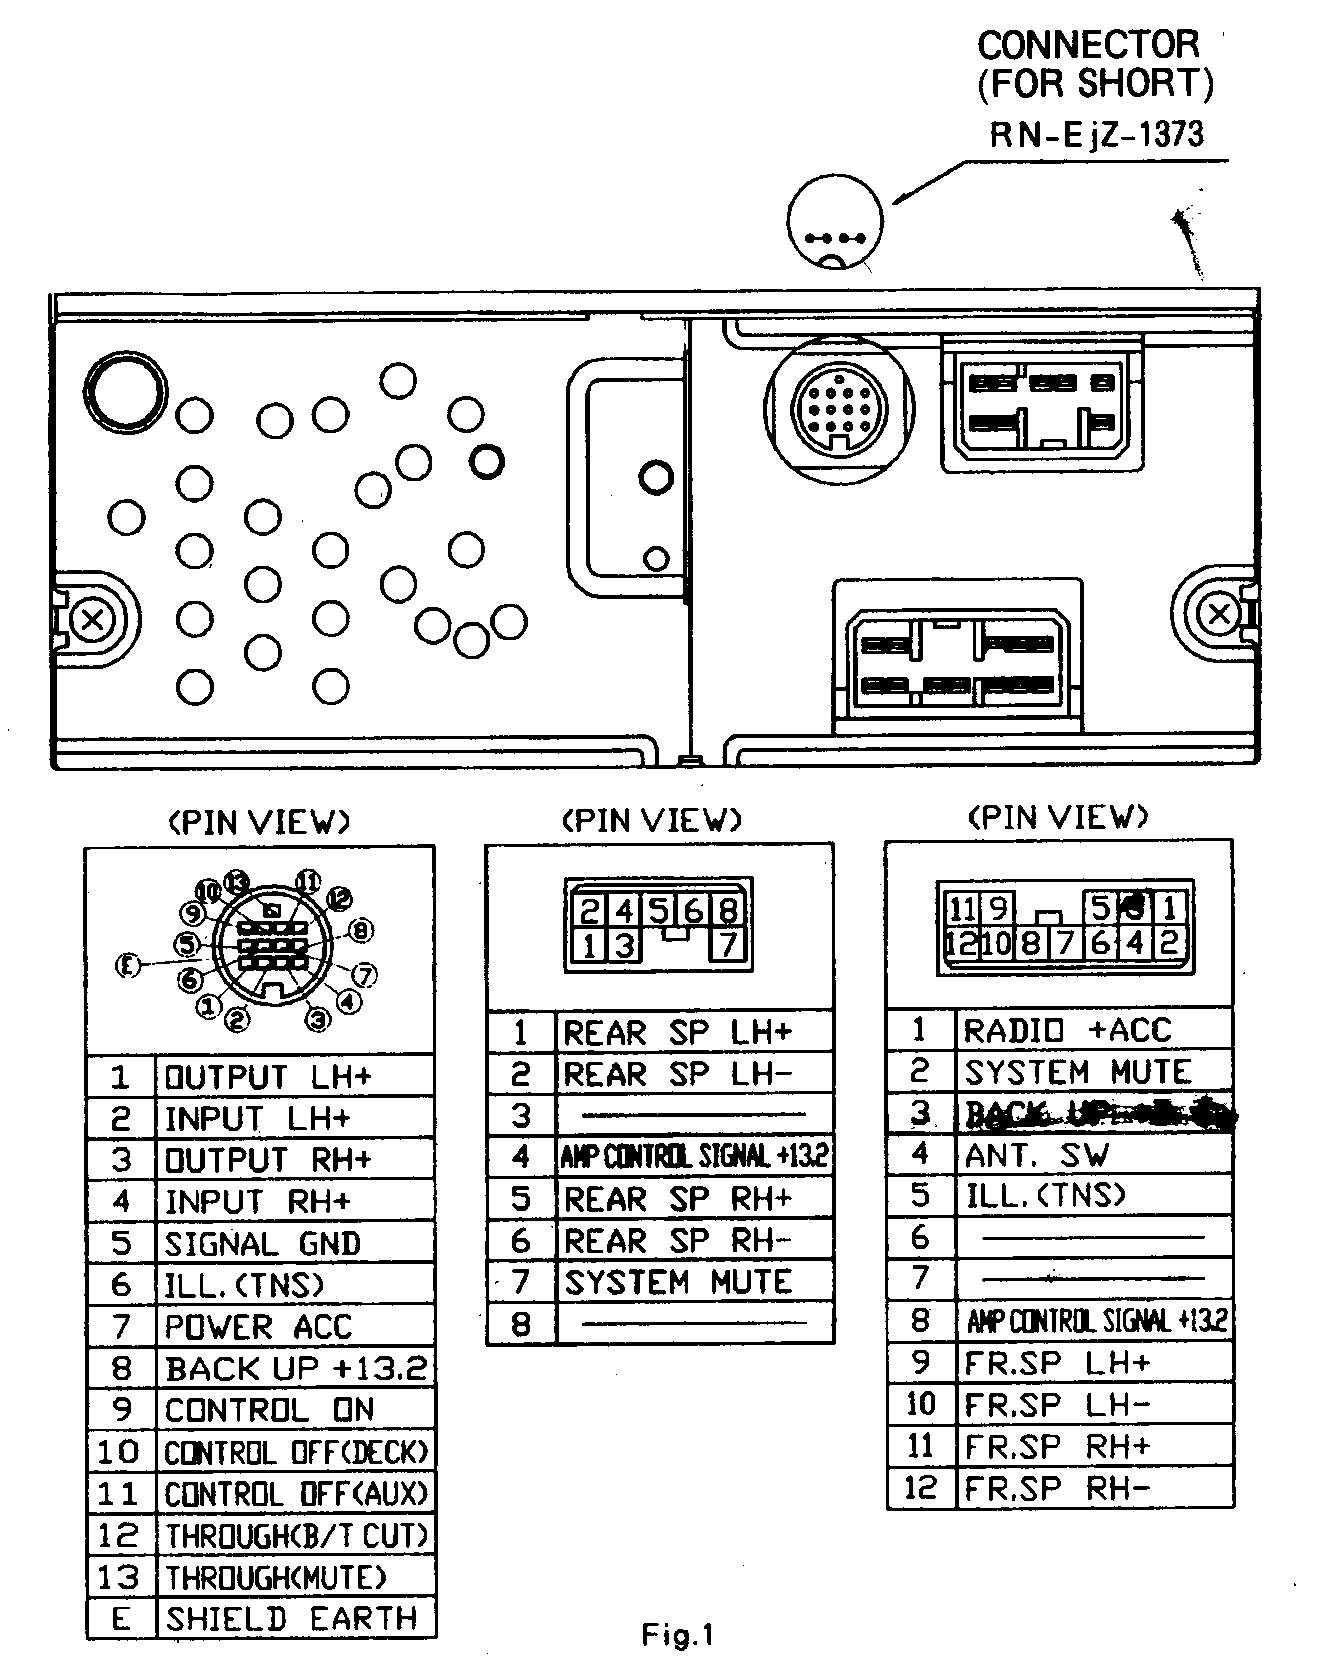 Toyota Fujitsu Ten 86120 Wiring Diagram In 2021 Car Stereo Wiring Diagram Wiring Diagram Car Stereo